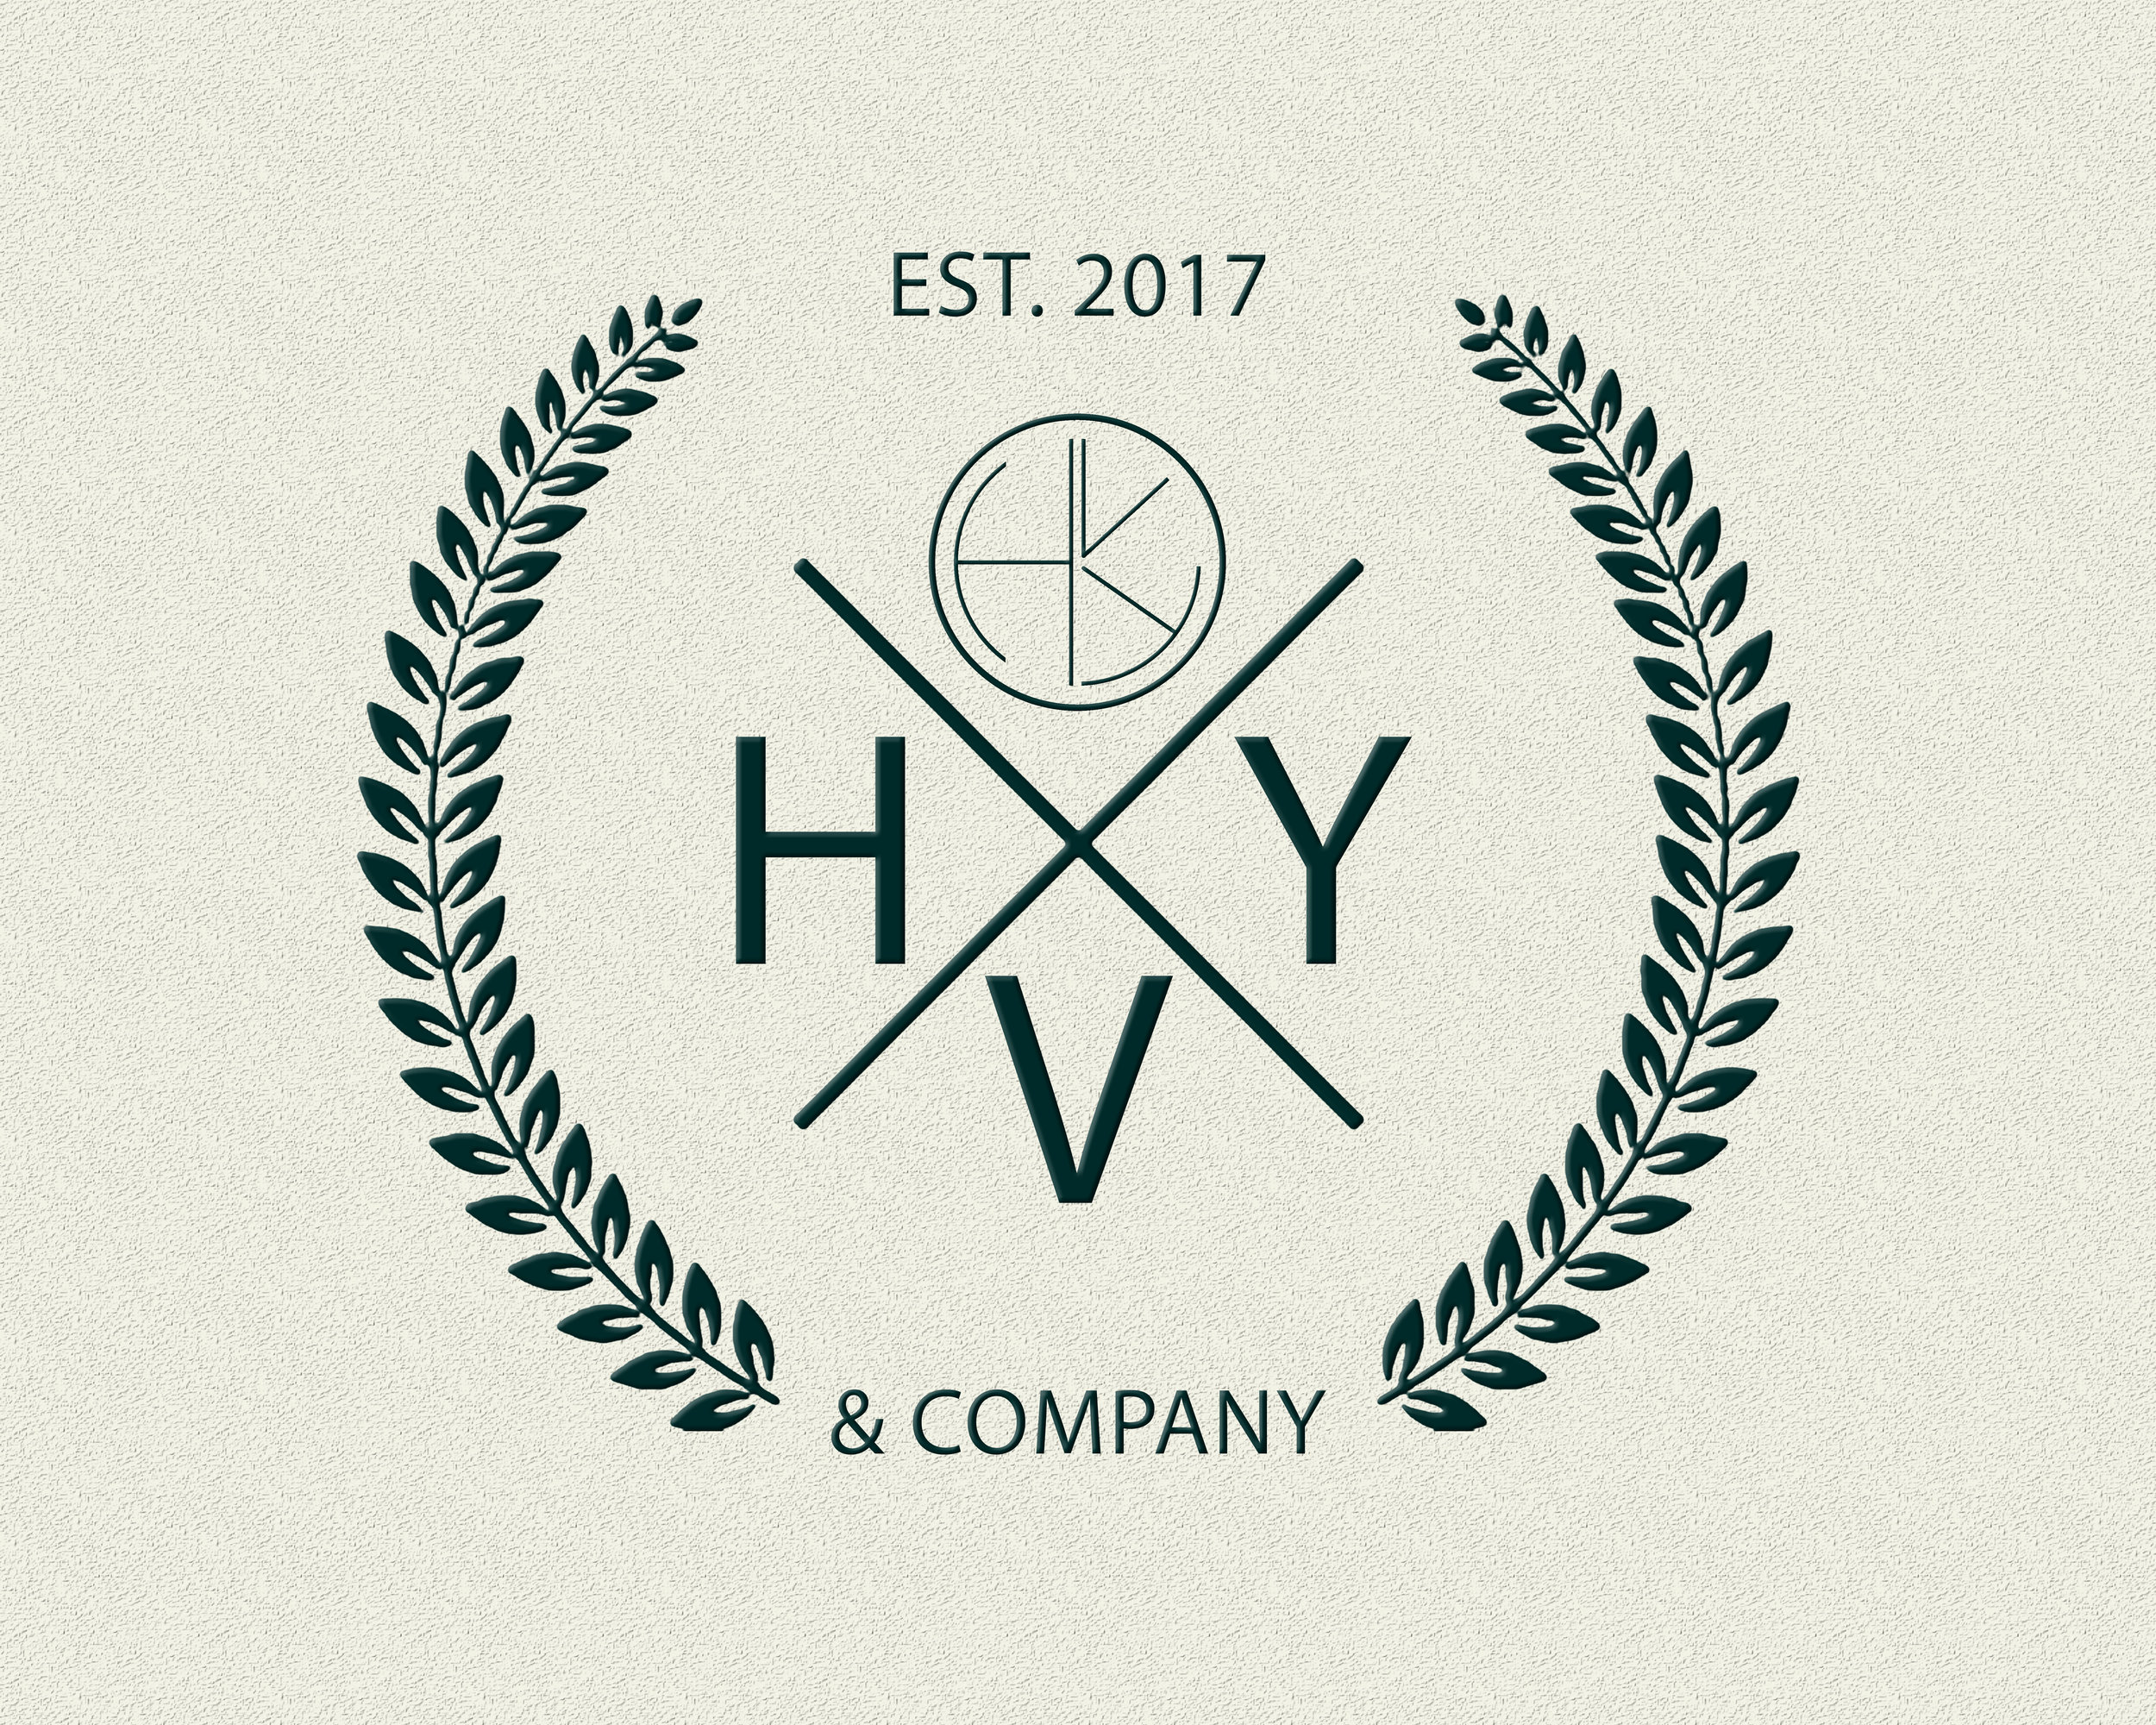 HVY_LOGO copy.jpg